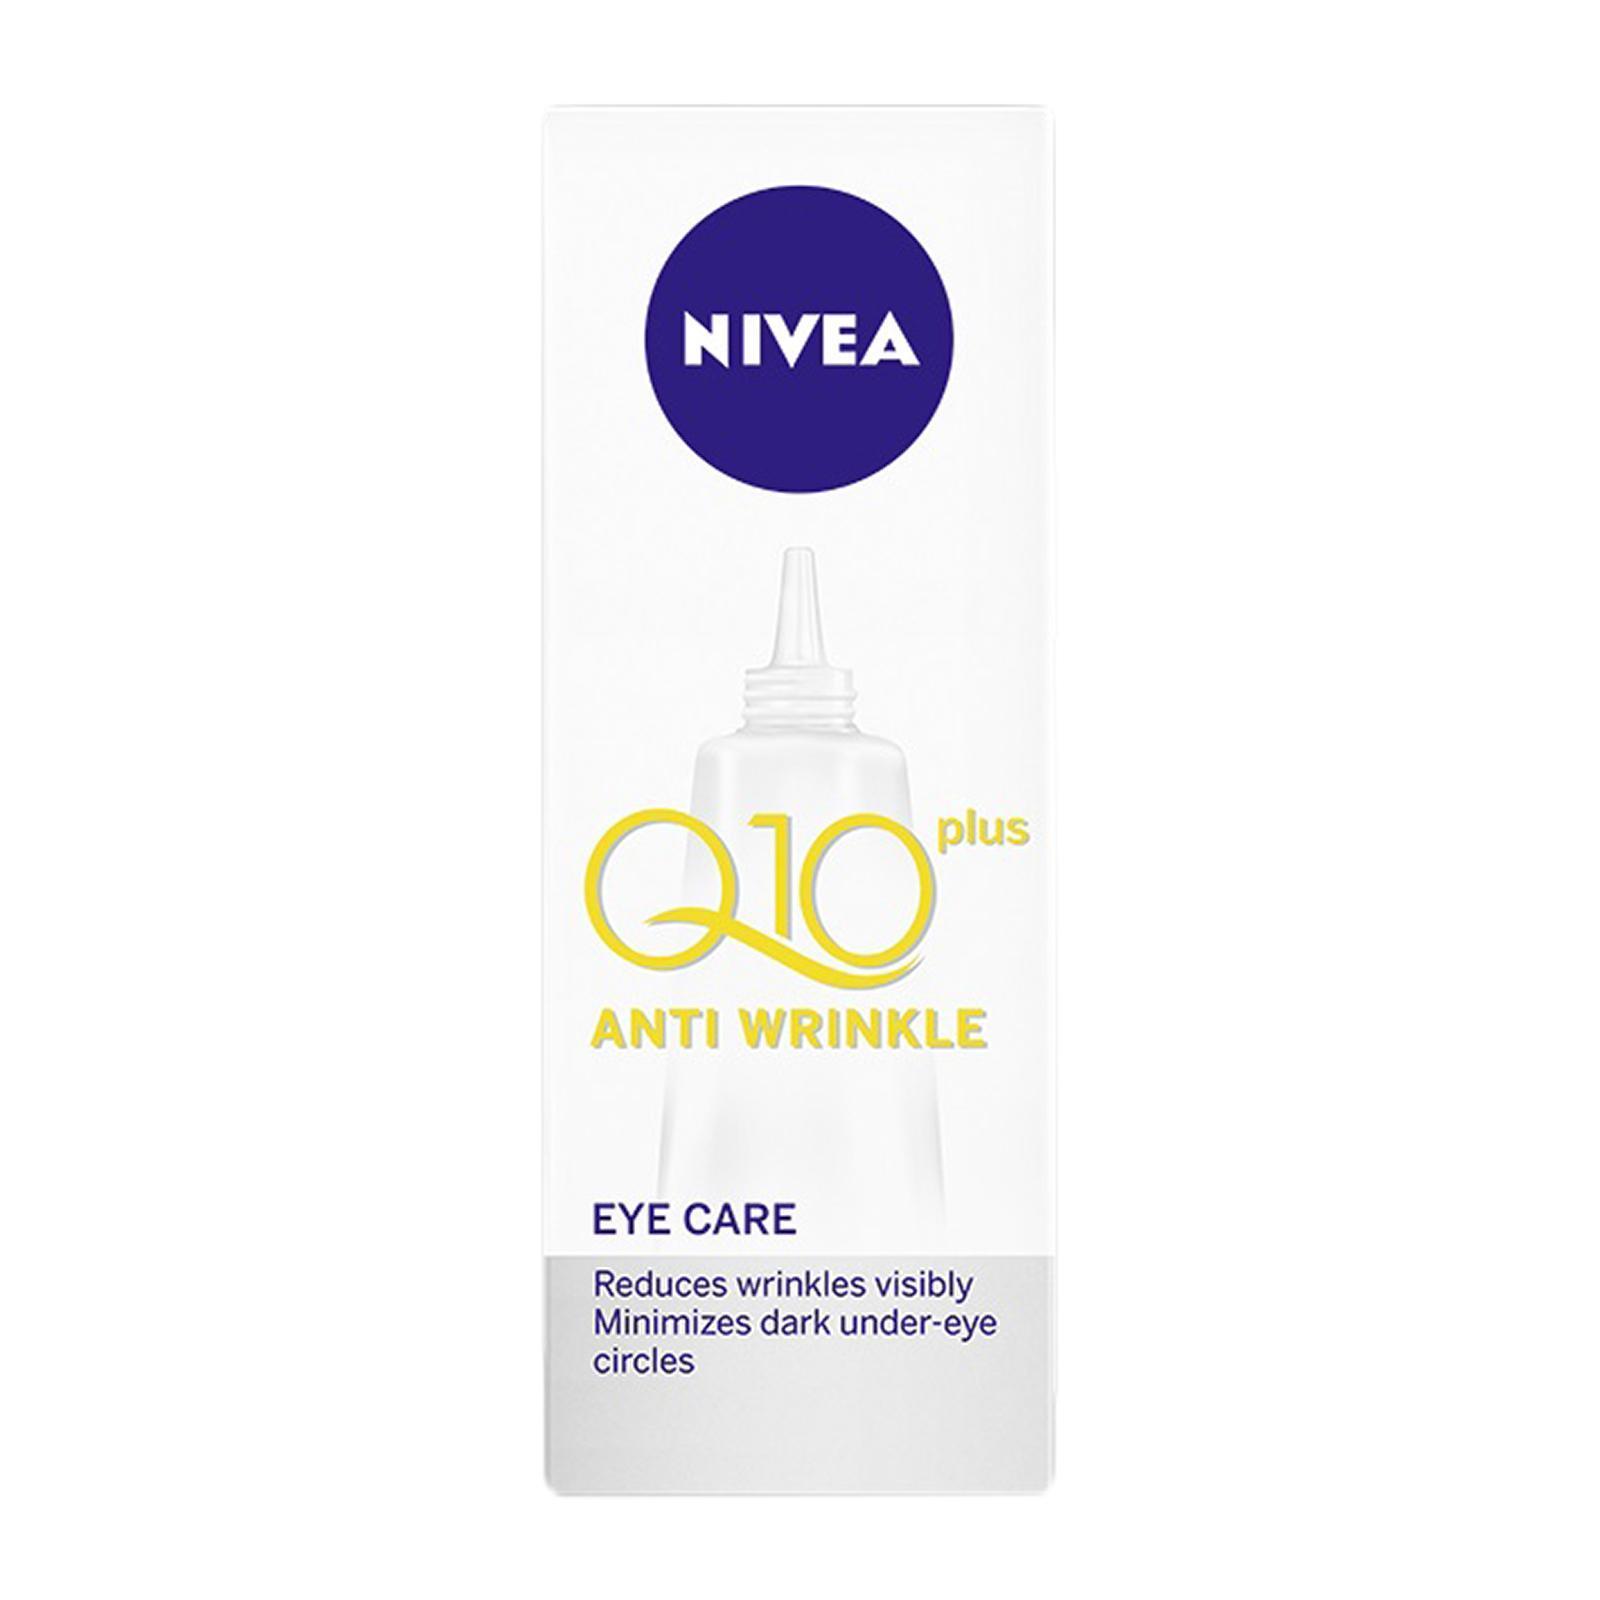 Nivea Face Care For Women Anti-Ageing Anti-Wrinkle Q10 Plus Eye Cream